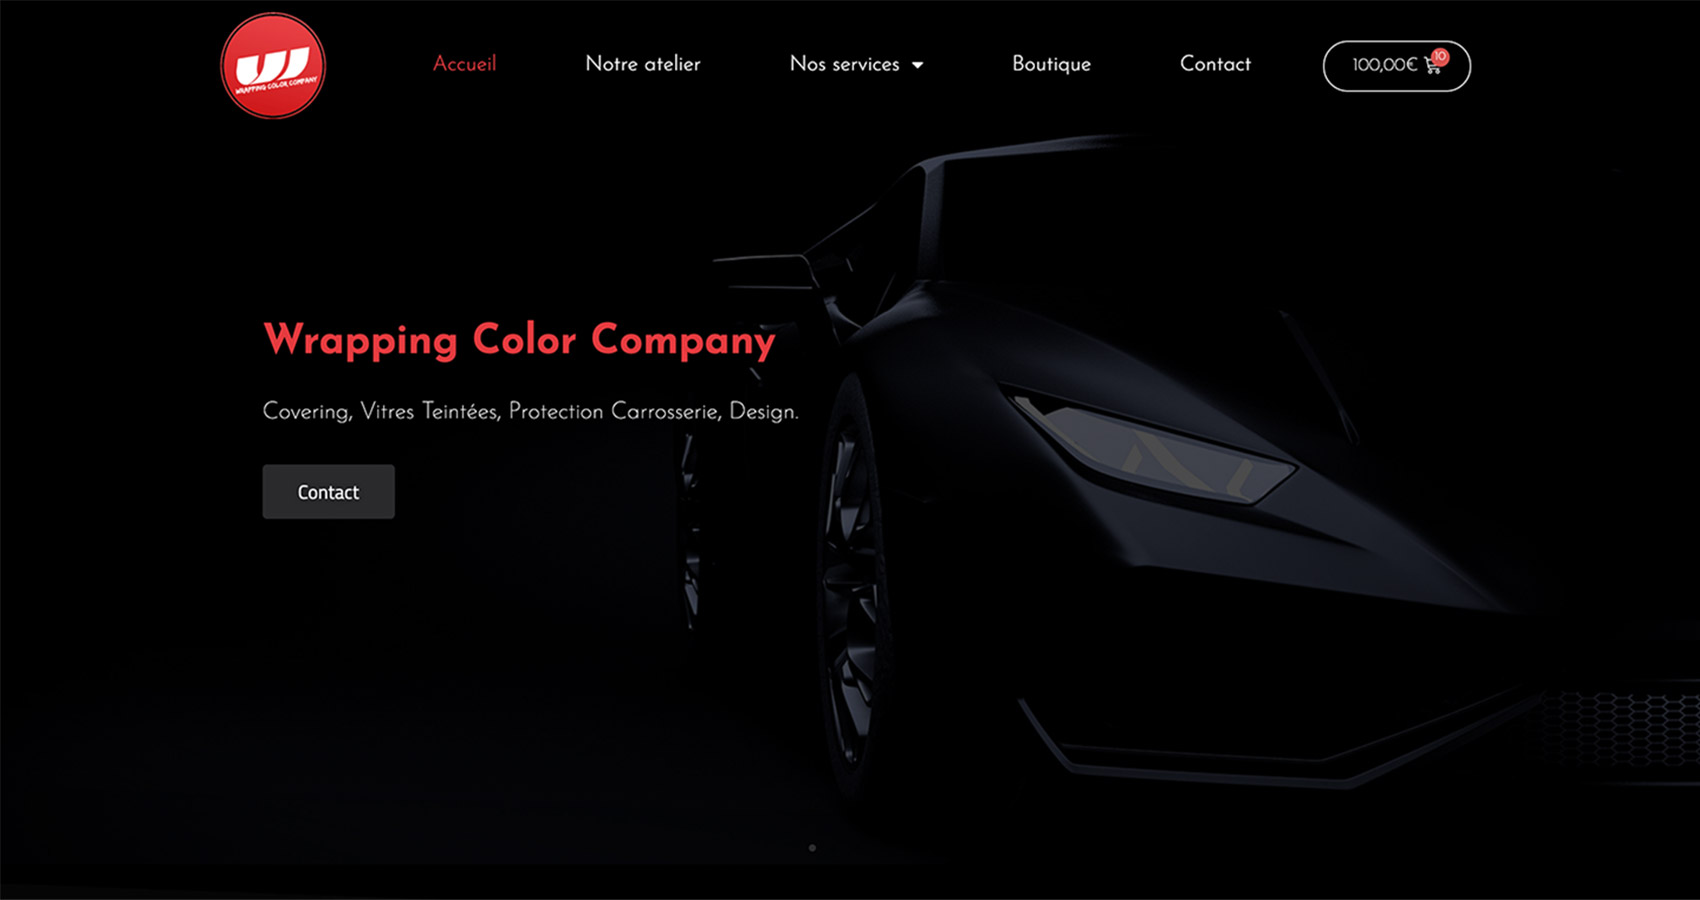 Création site web - Aperçu Wrapping Color Company